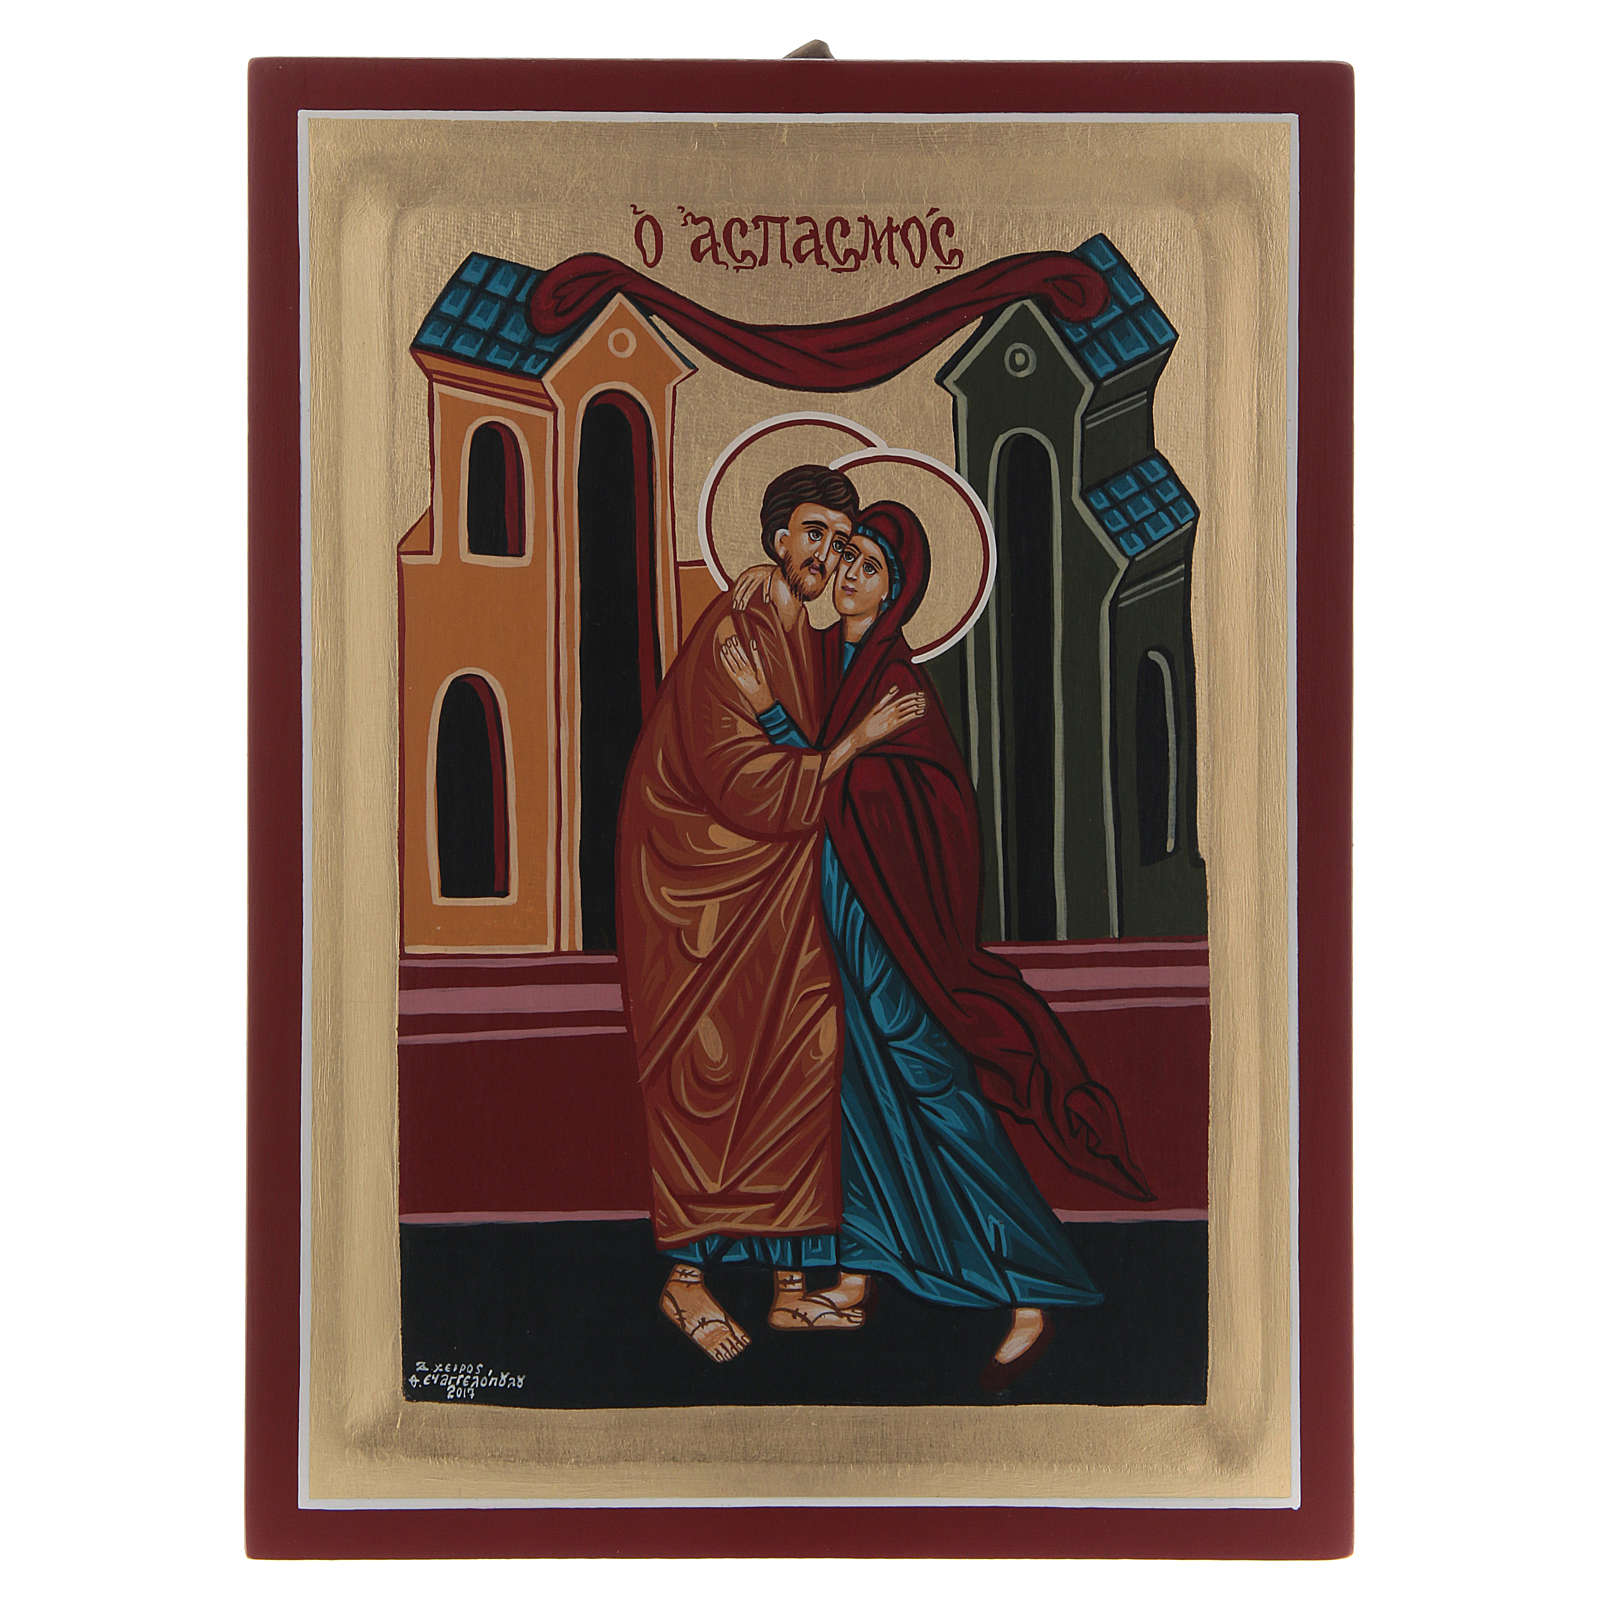 The wedding of Saint Anne and Saint Joachim 4